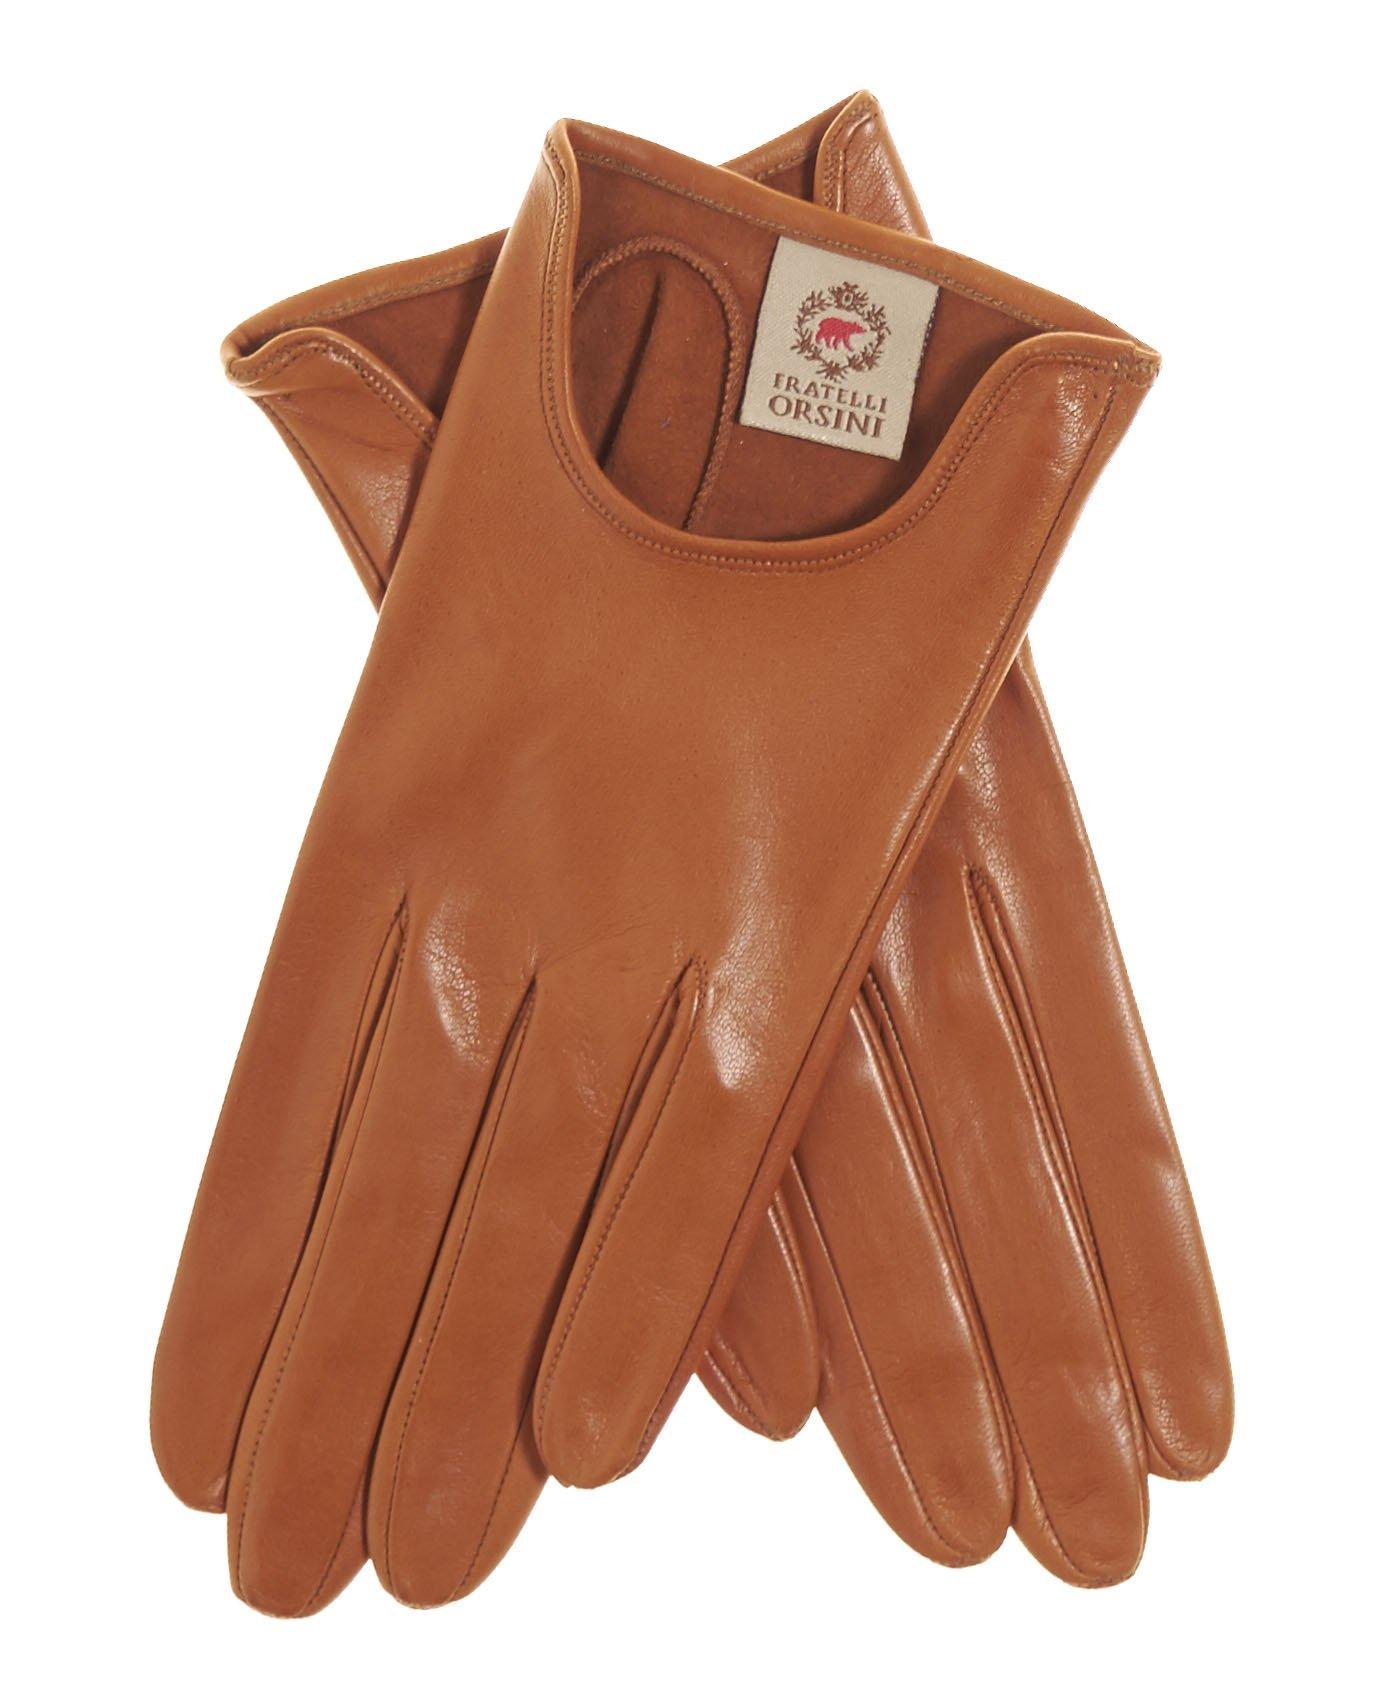 Fratelli Orsini Women's Short Unlined Italian Leather Gloves Size 7 Color Cognac